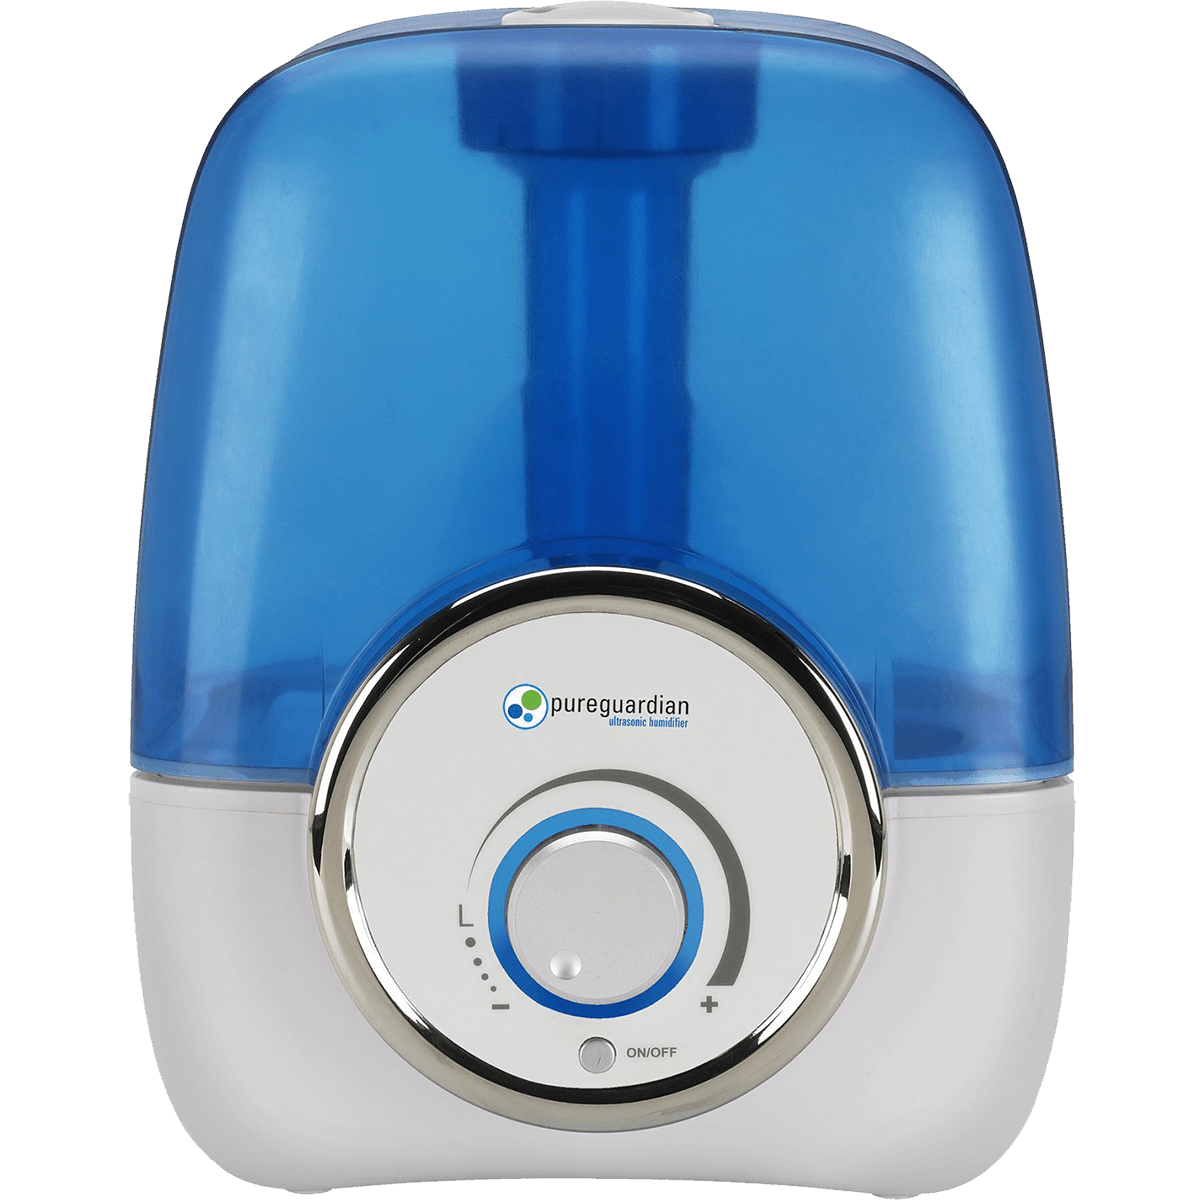 Pureguardian 100 Hour Ultrasonic Cool Mist Humidifier